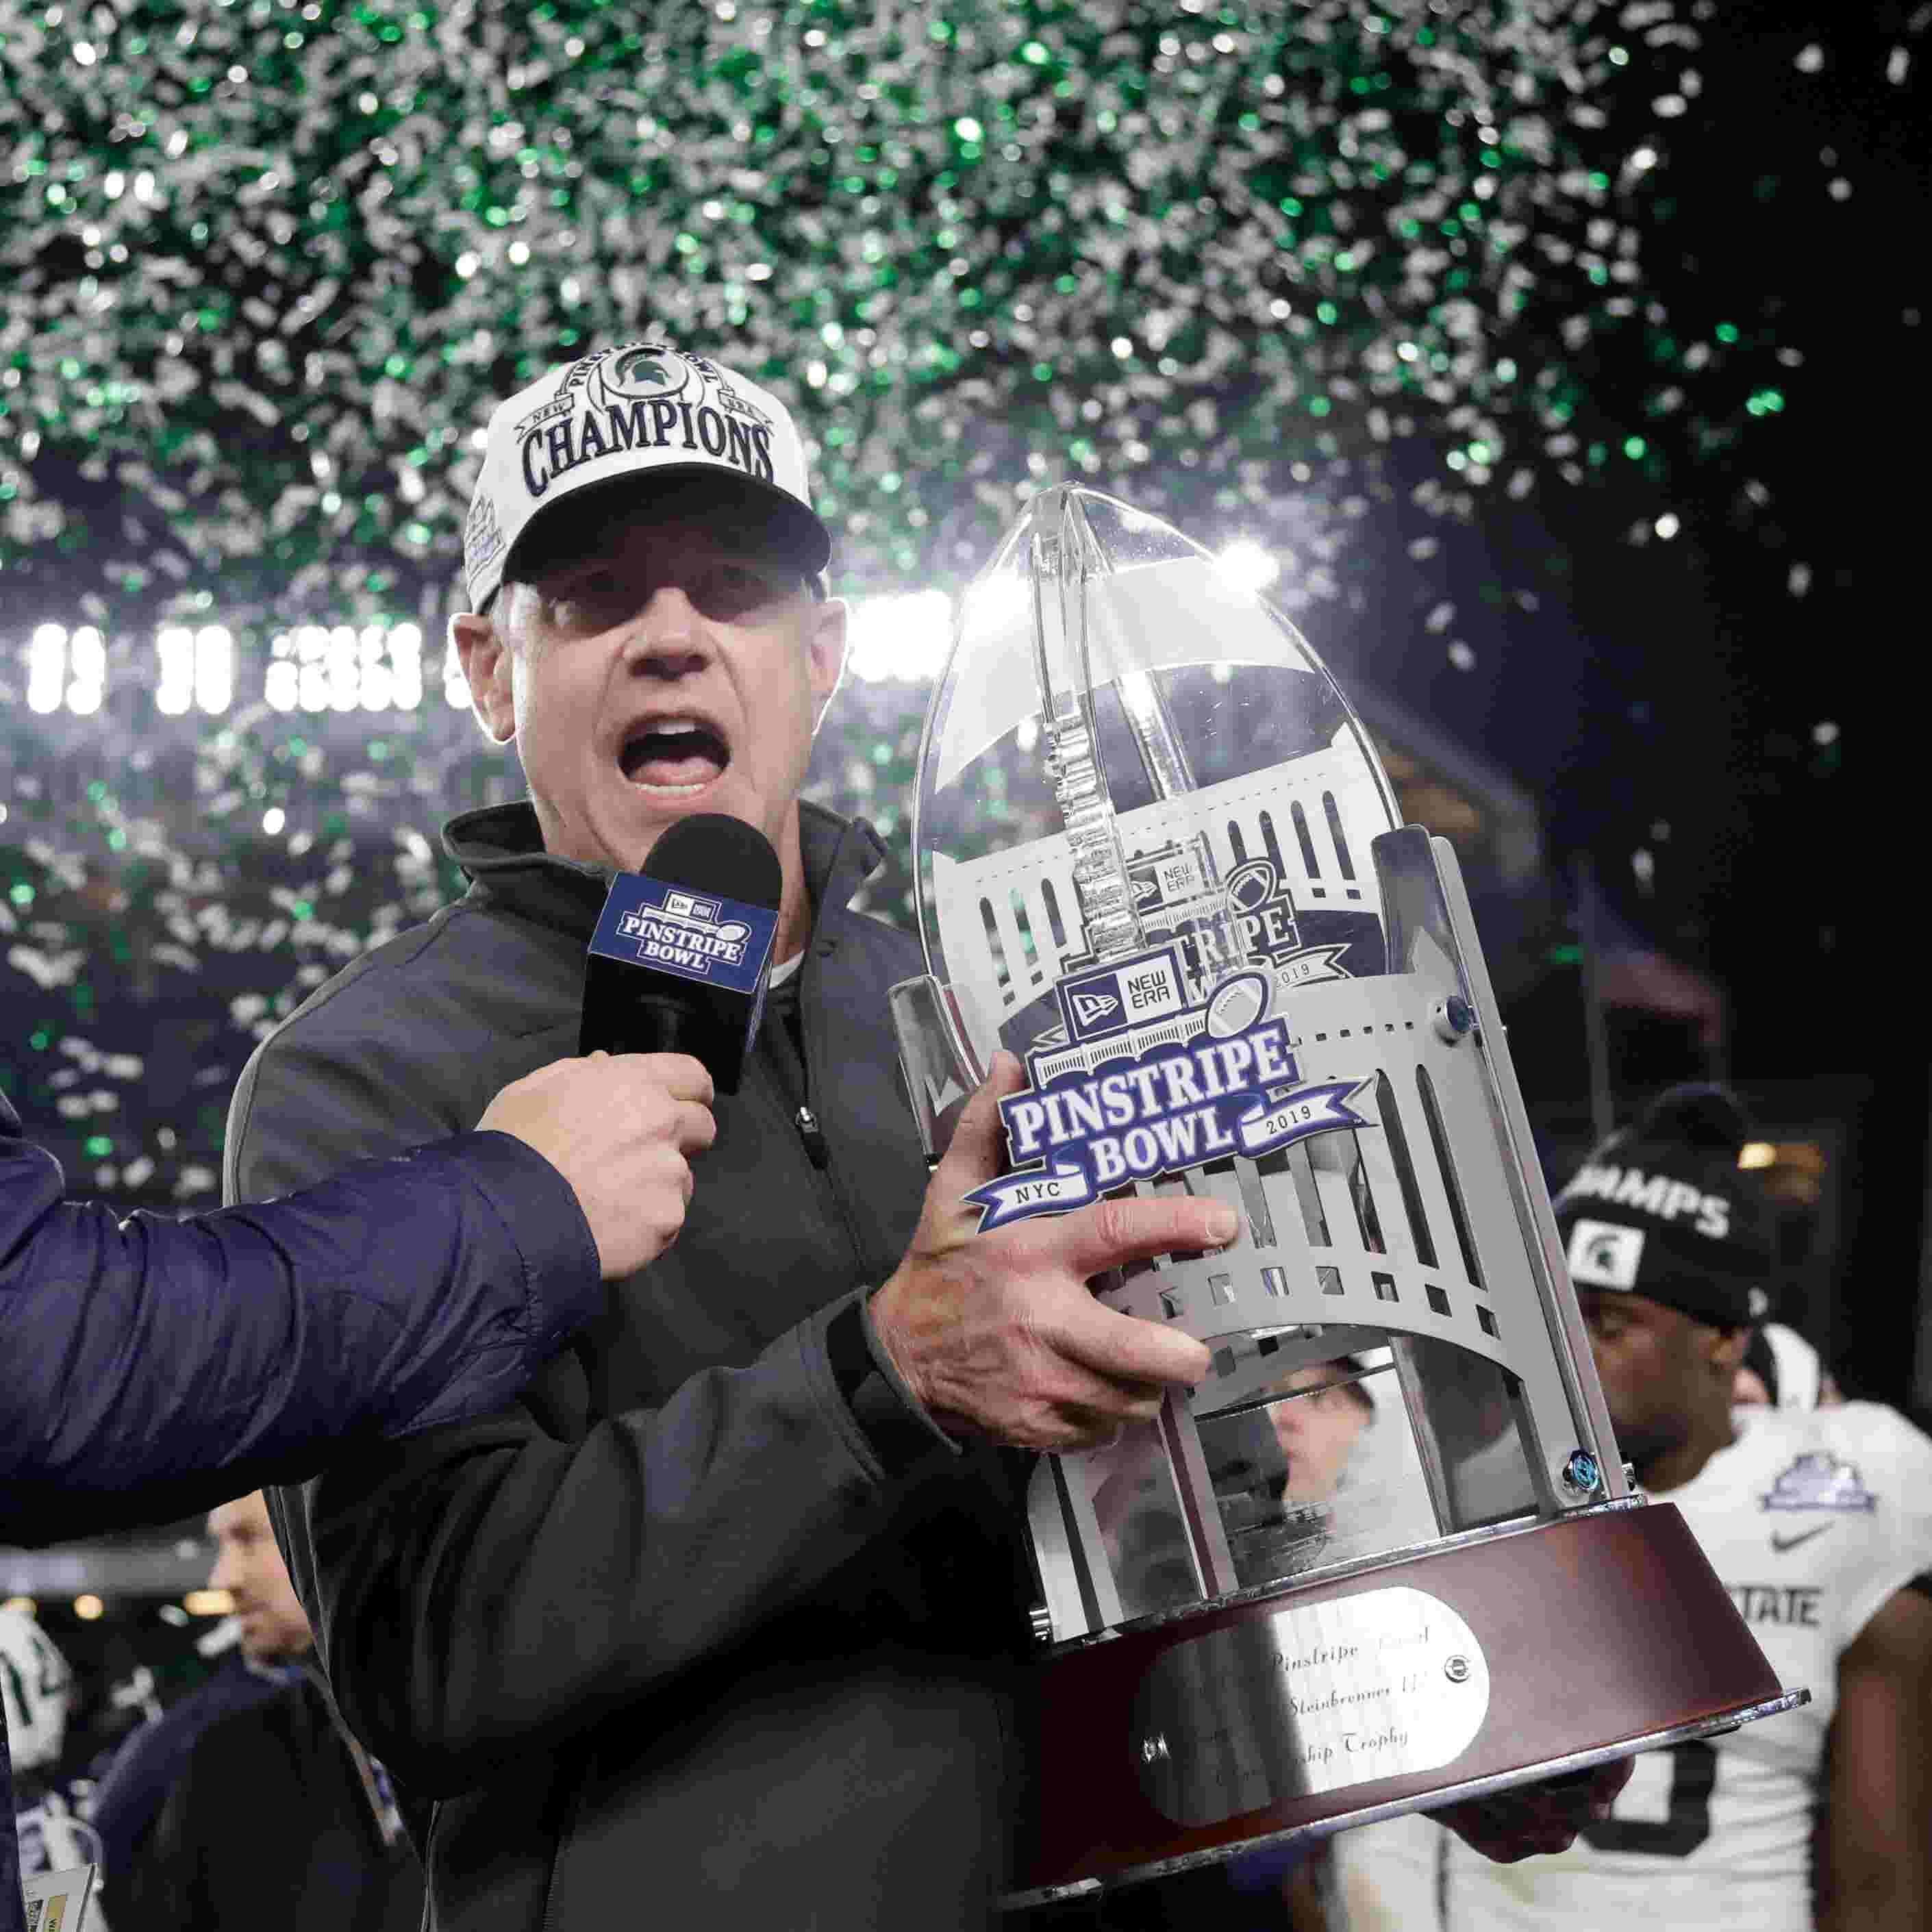 Michigan State S Mark Dantonio Won A Bowl Game It S Up To